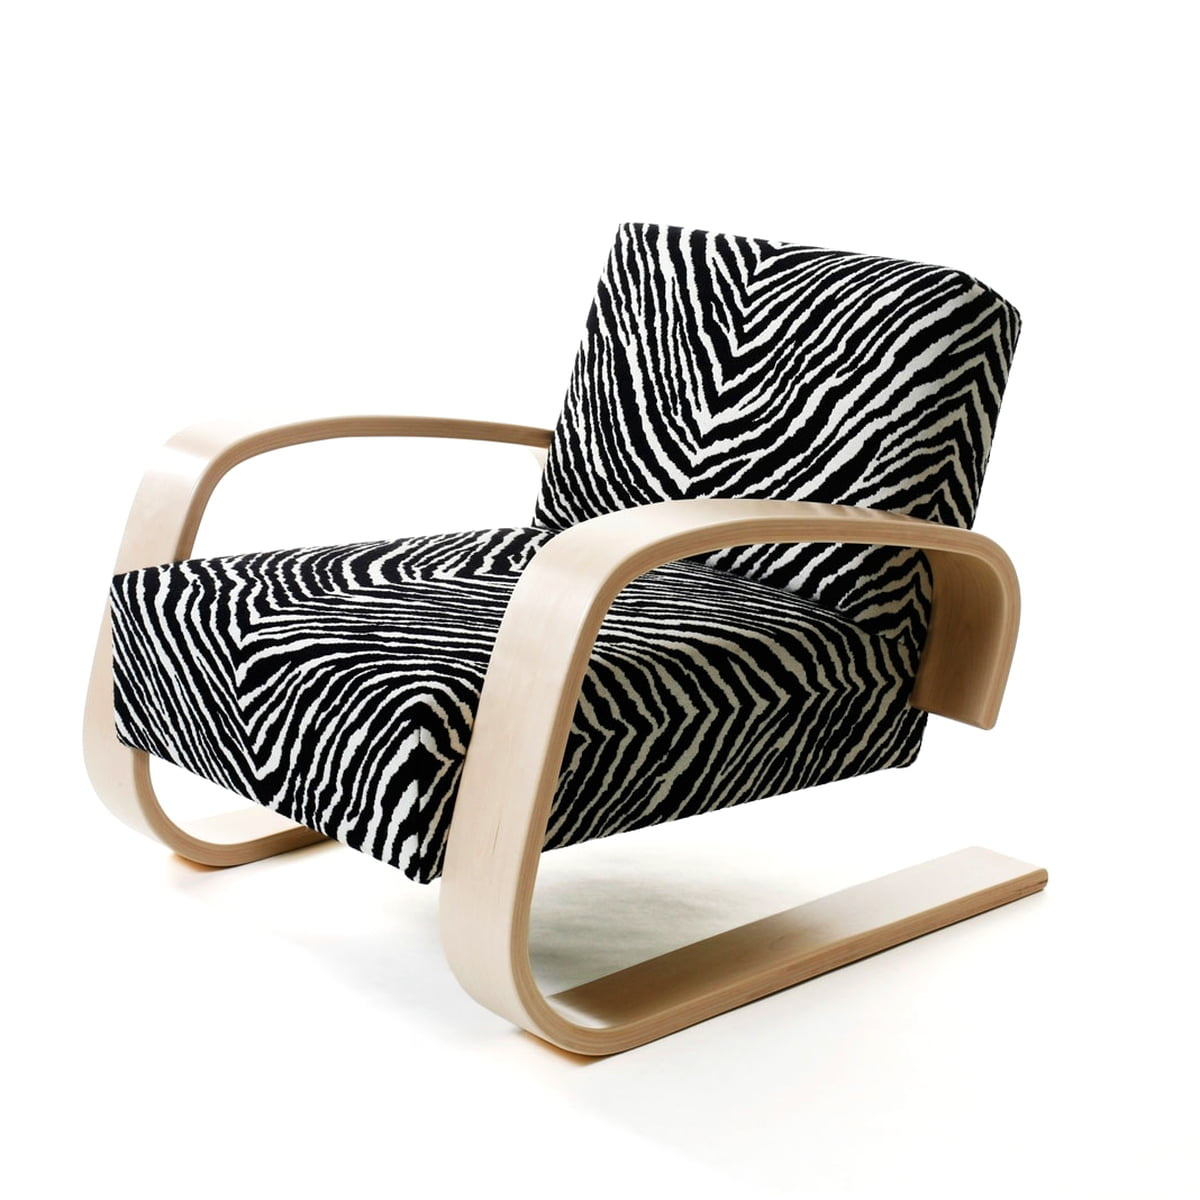 zebra arm chair. Artek - Armchair 400 Tank Chair, Zebra Cover Arm Chair 2